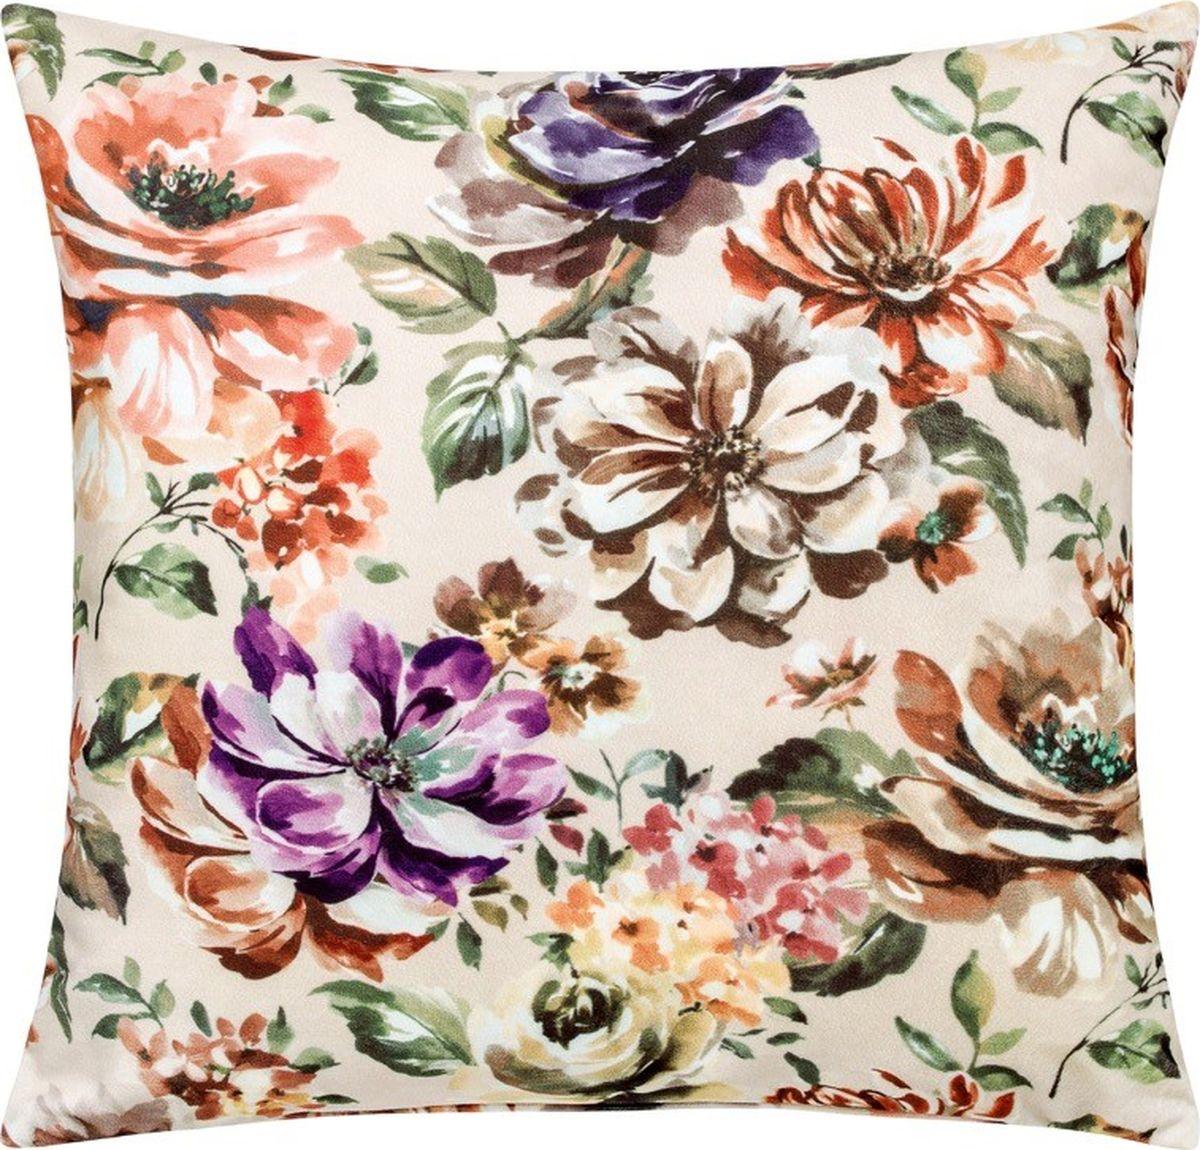 Подушка декоративная Togas Лена, цвет: белый, 45 х 45 см40.16.70.0278